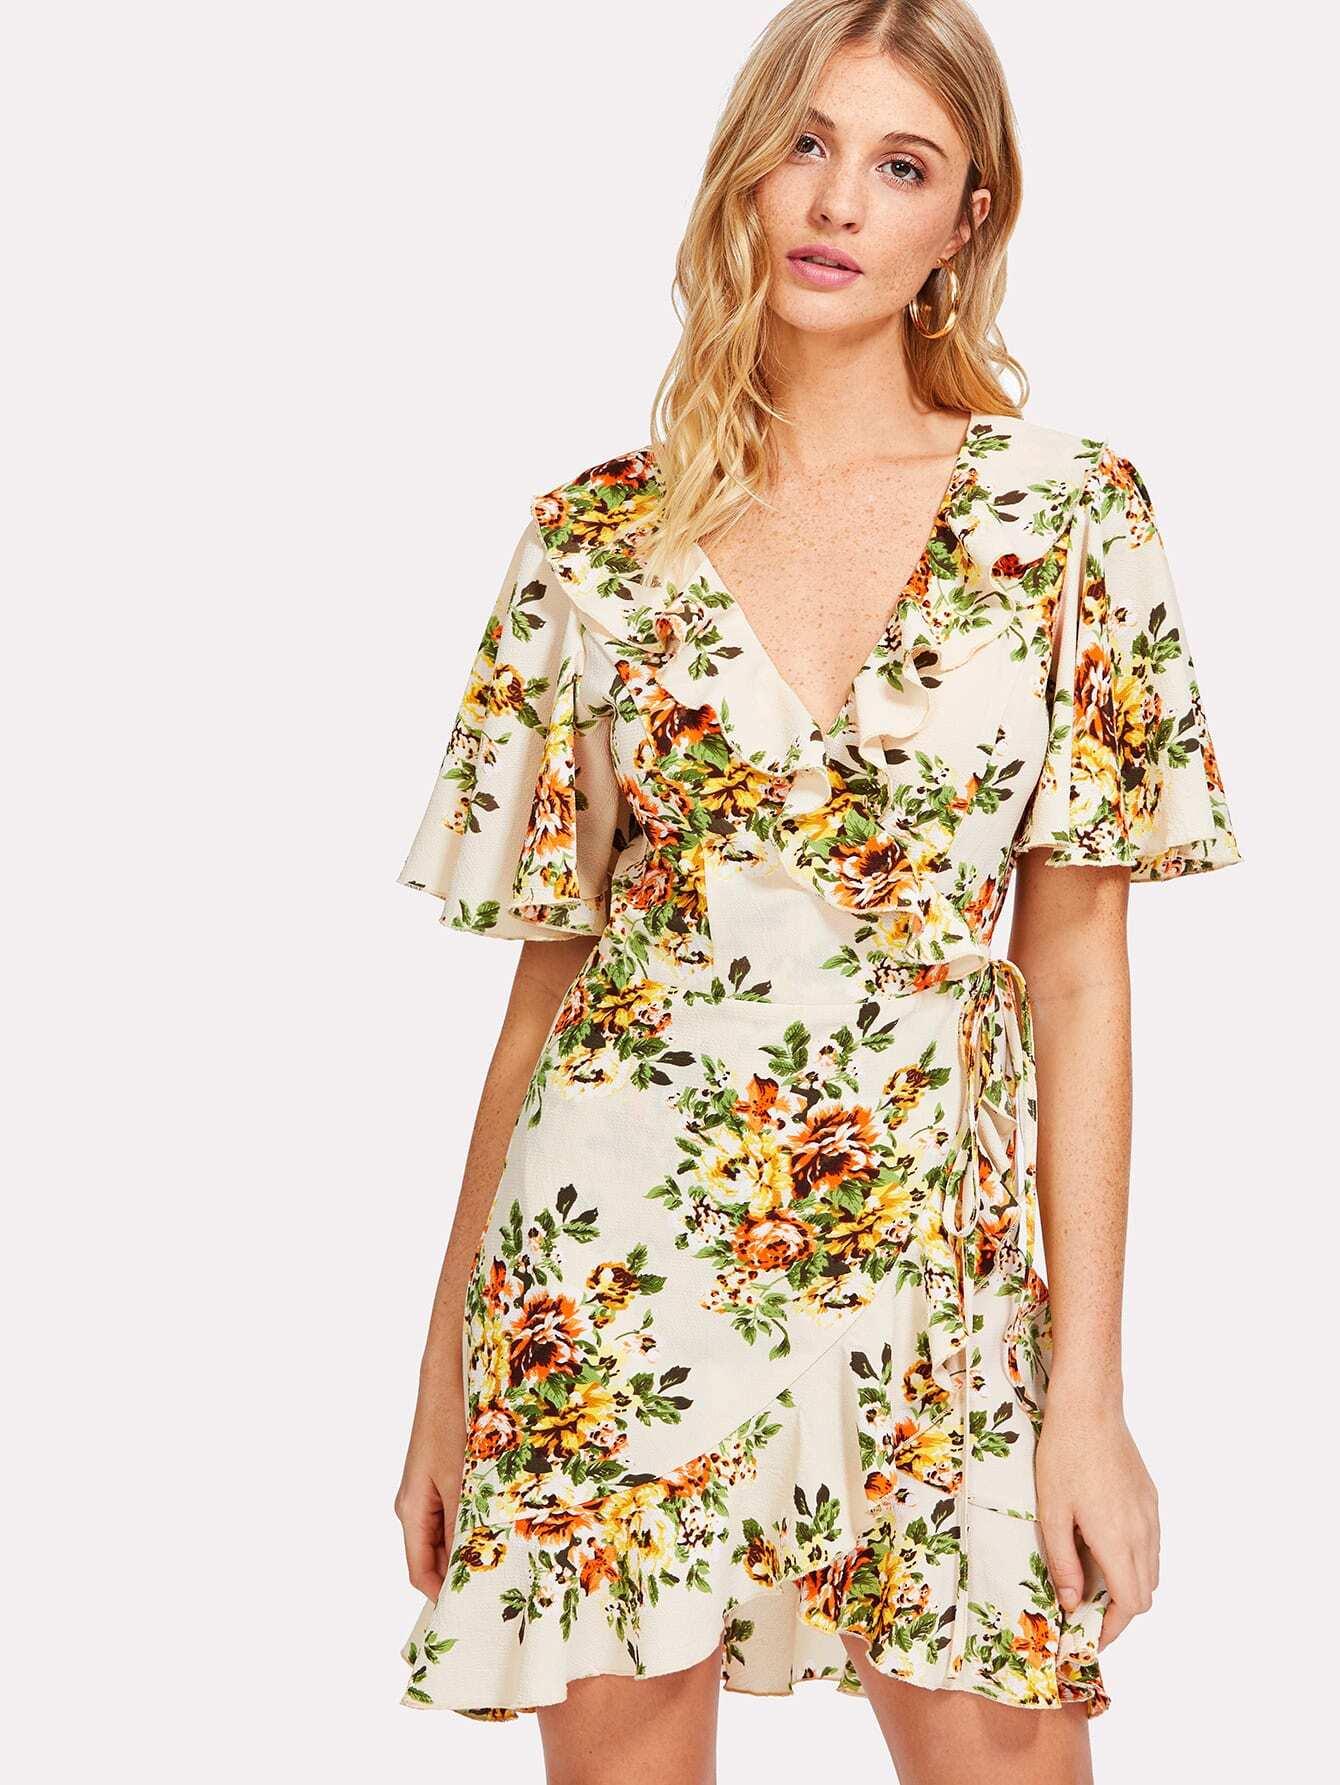 Allover Floral Print Wrap Dress allover bear print dress